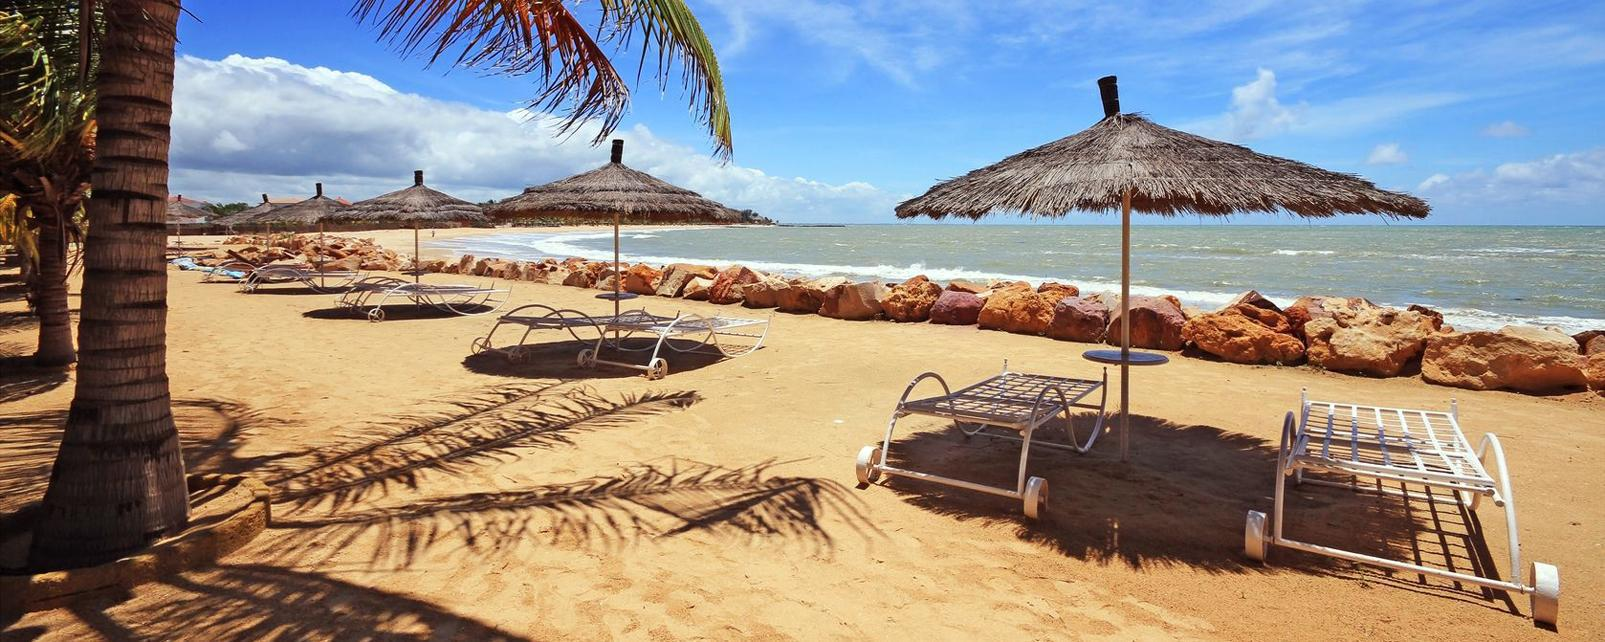 Куротное место Сали. Сенегал